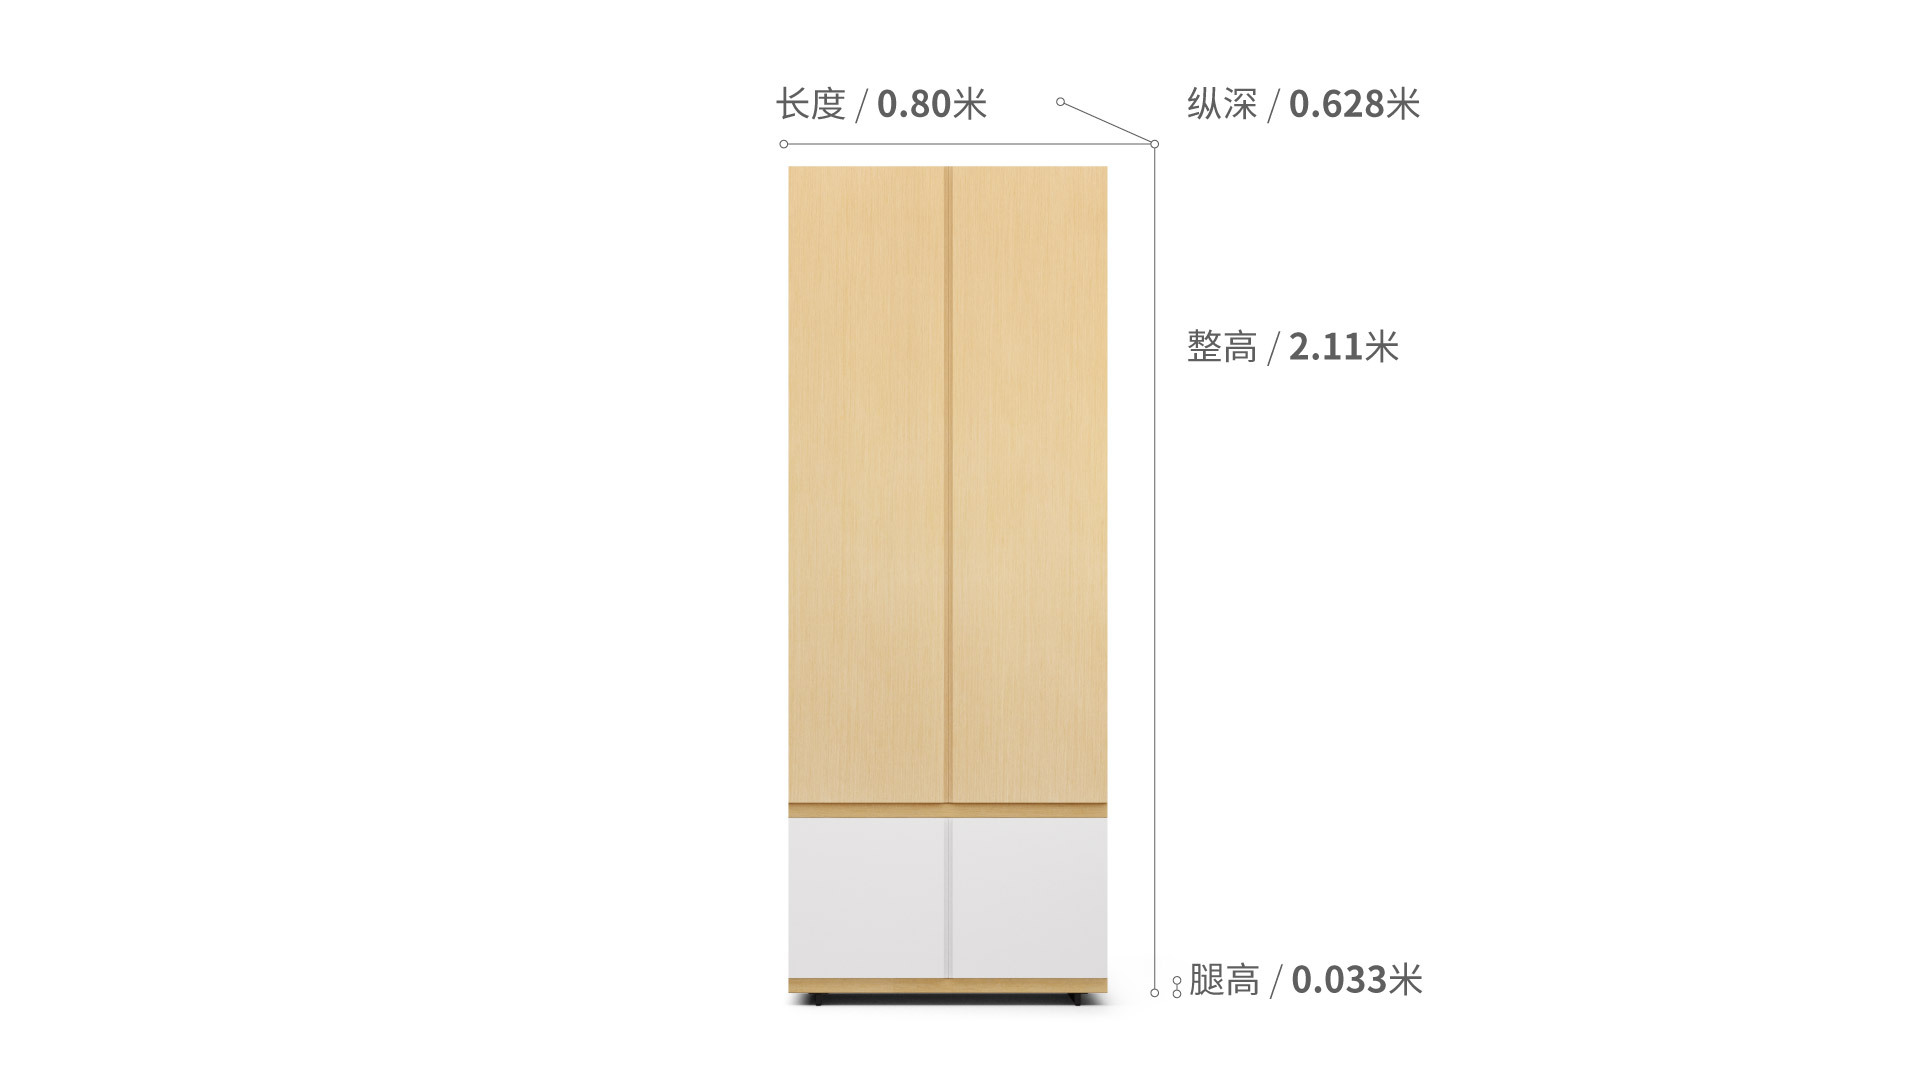 COSMO星格™衣柜·斗柜2.1米高2门衣柜D柜架效果图